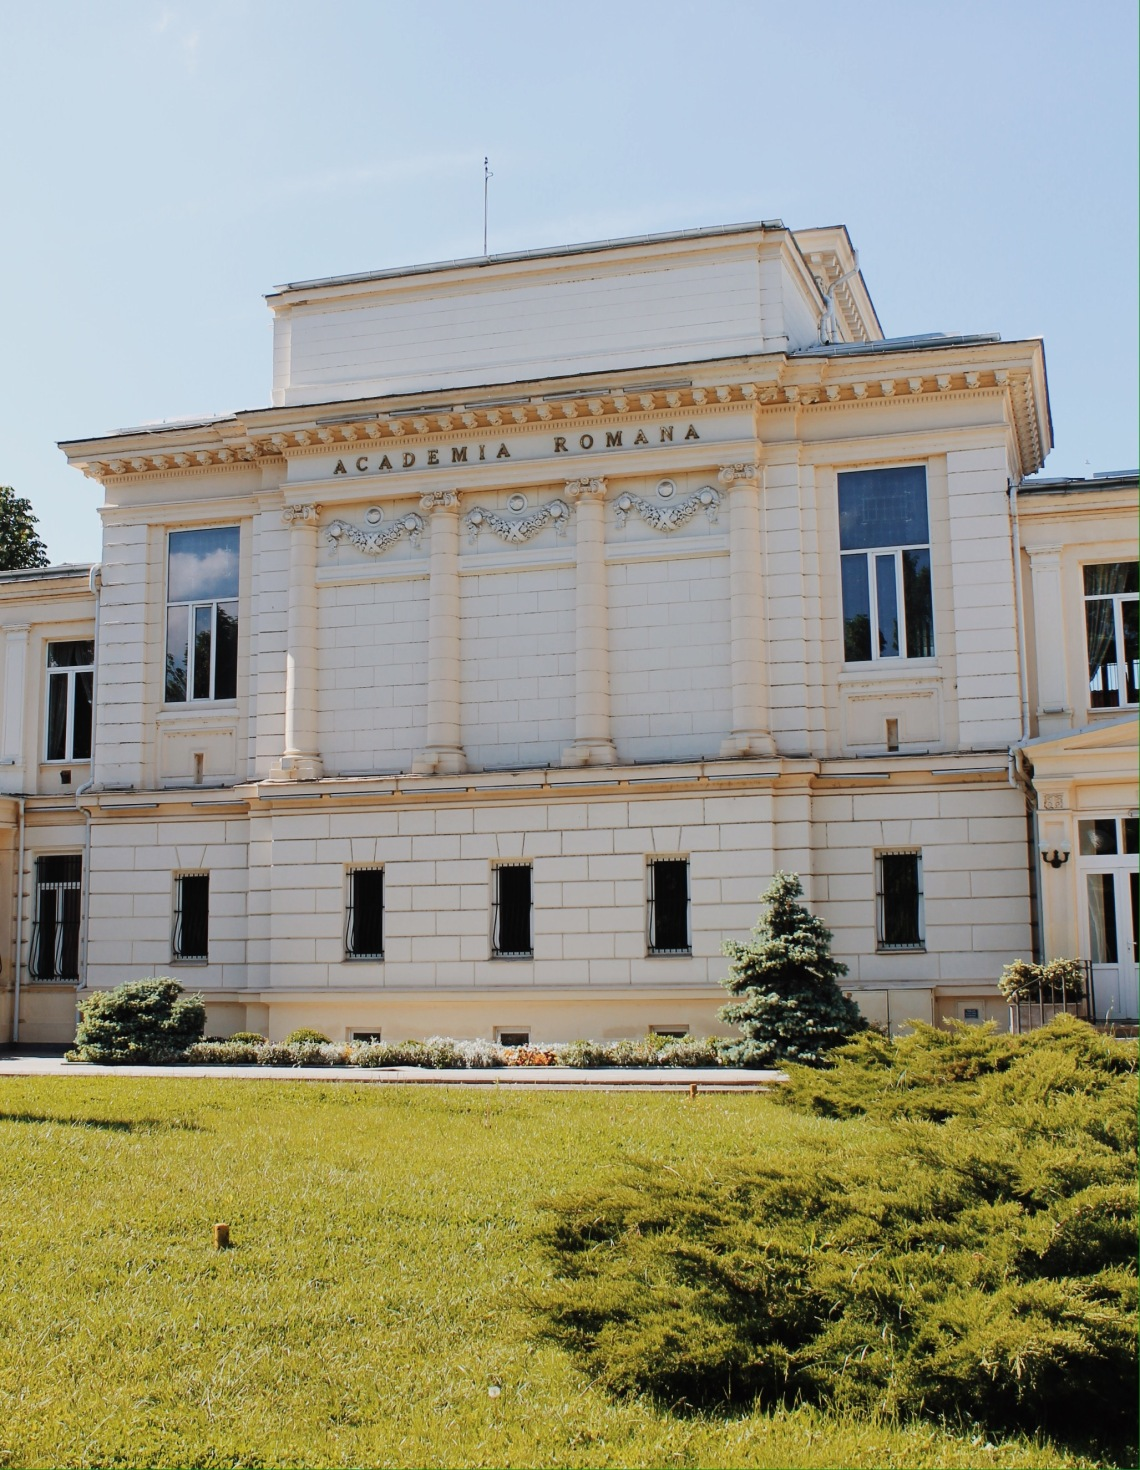 Romanian Academy, Victoriei Street (Calea Victoriei), Bucharest Romania